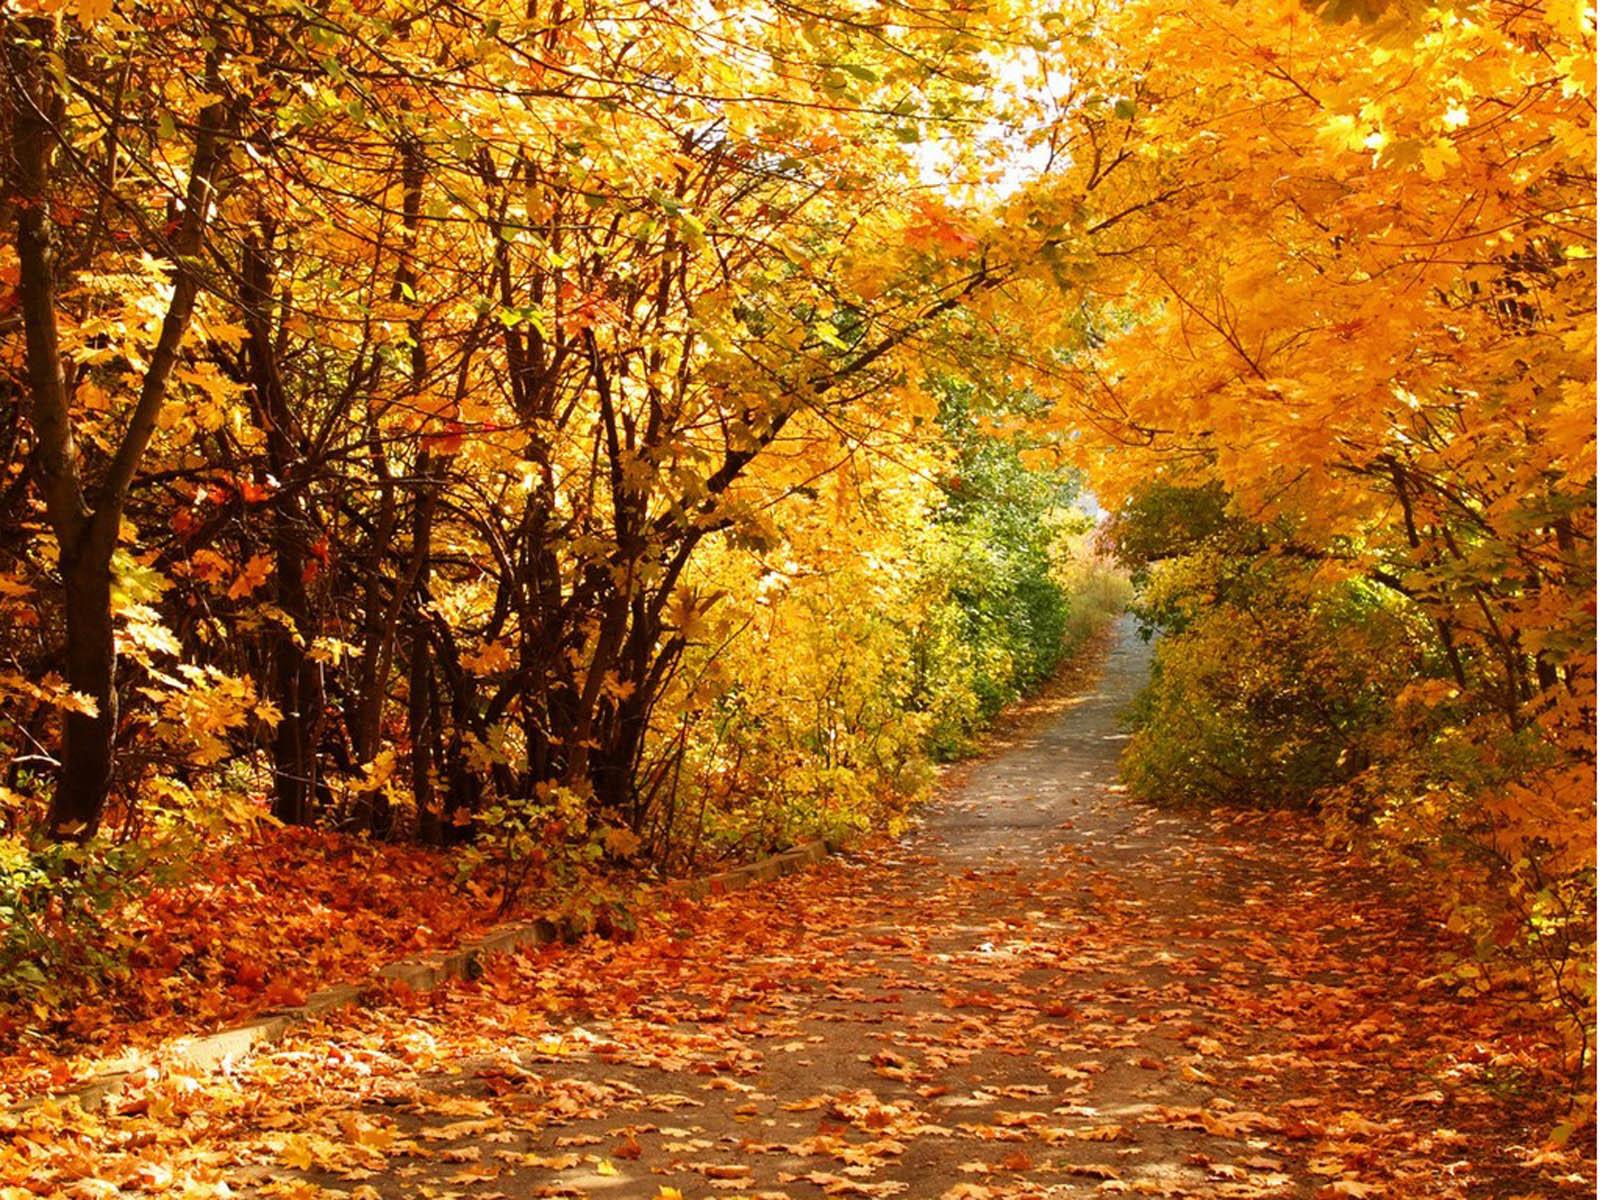 Autumn Scenery Desktop BackgroundsBeautiful Autumn Scenery Photos 1600x1200